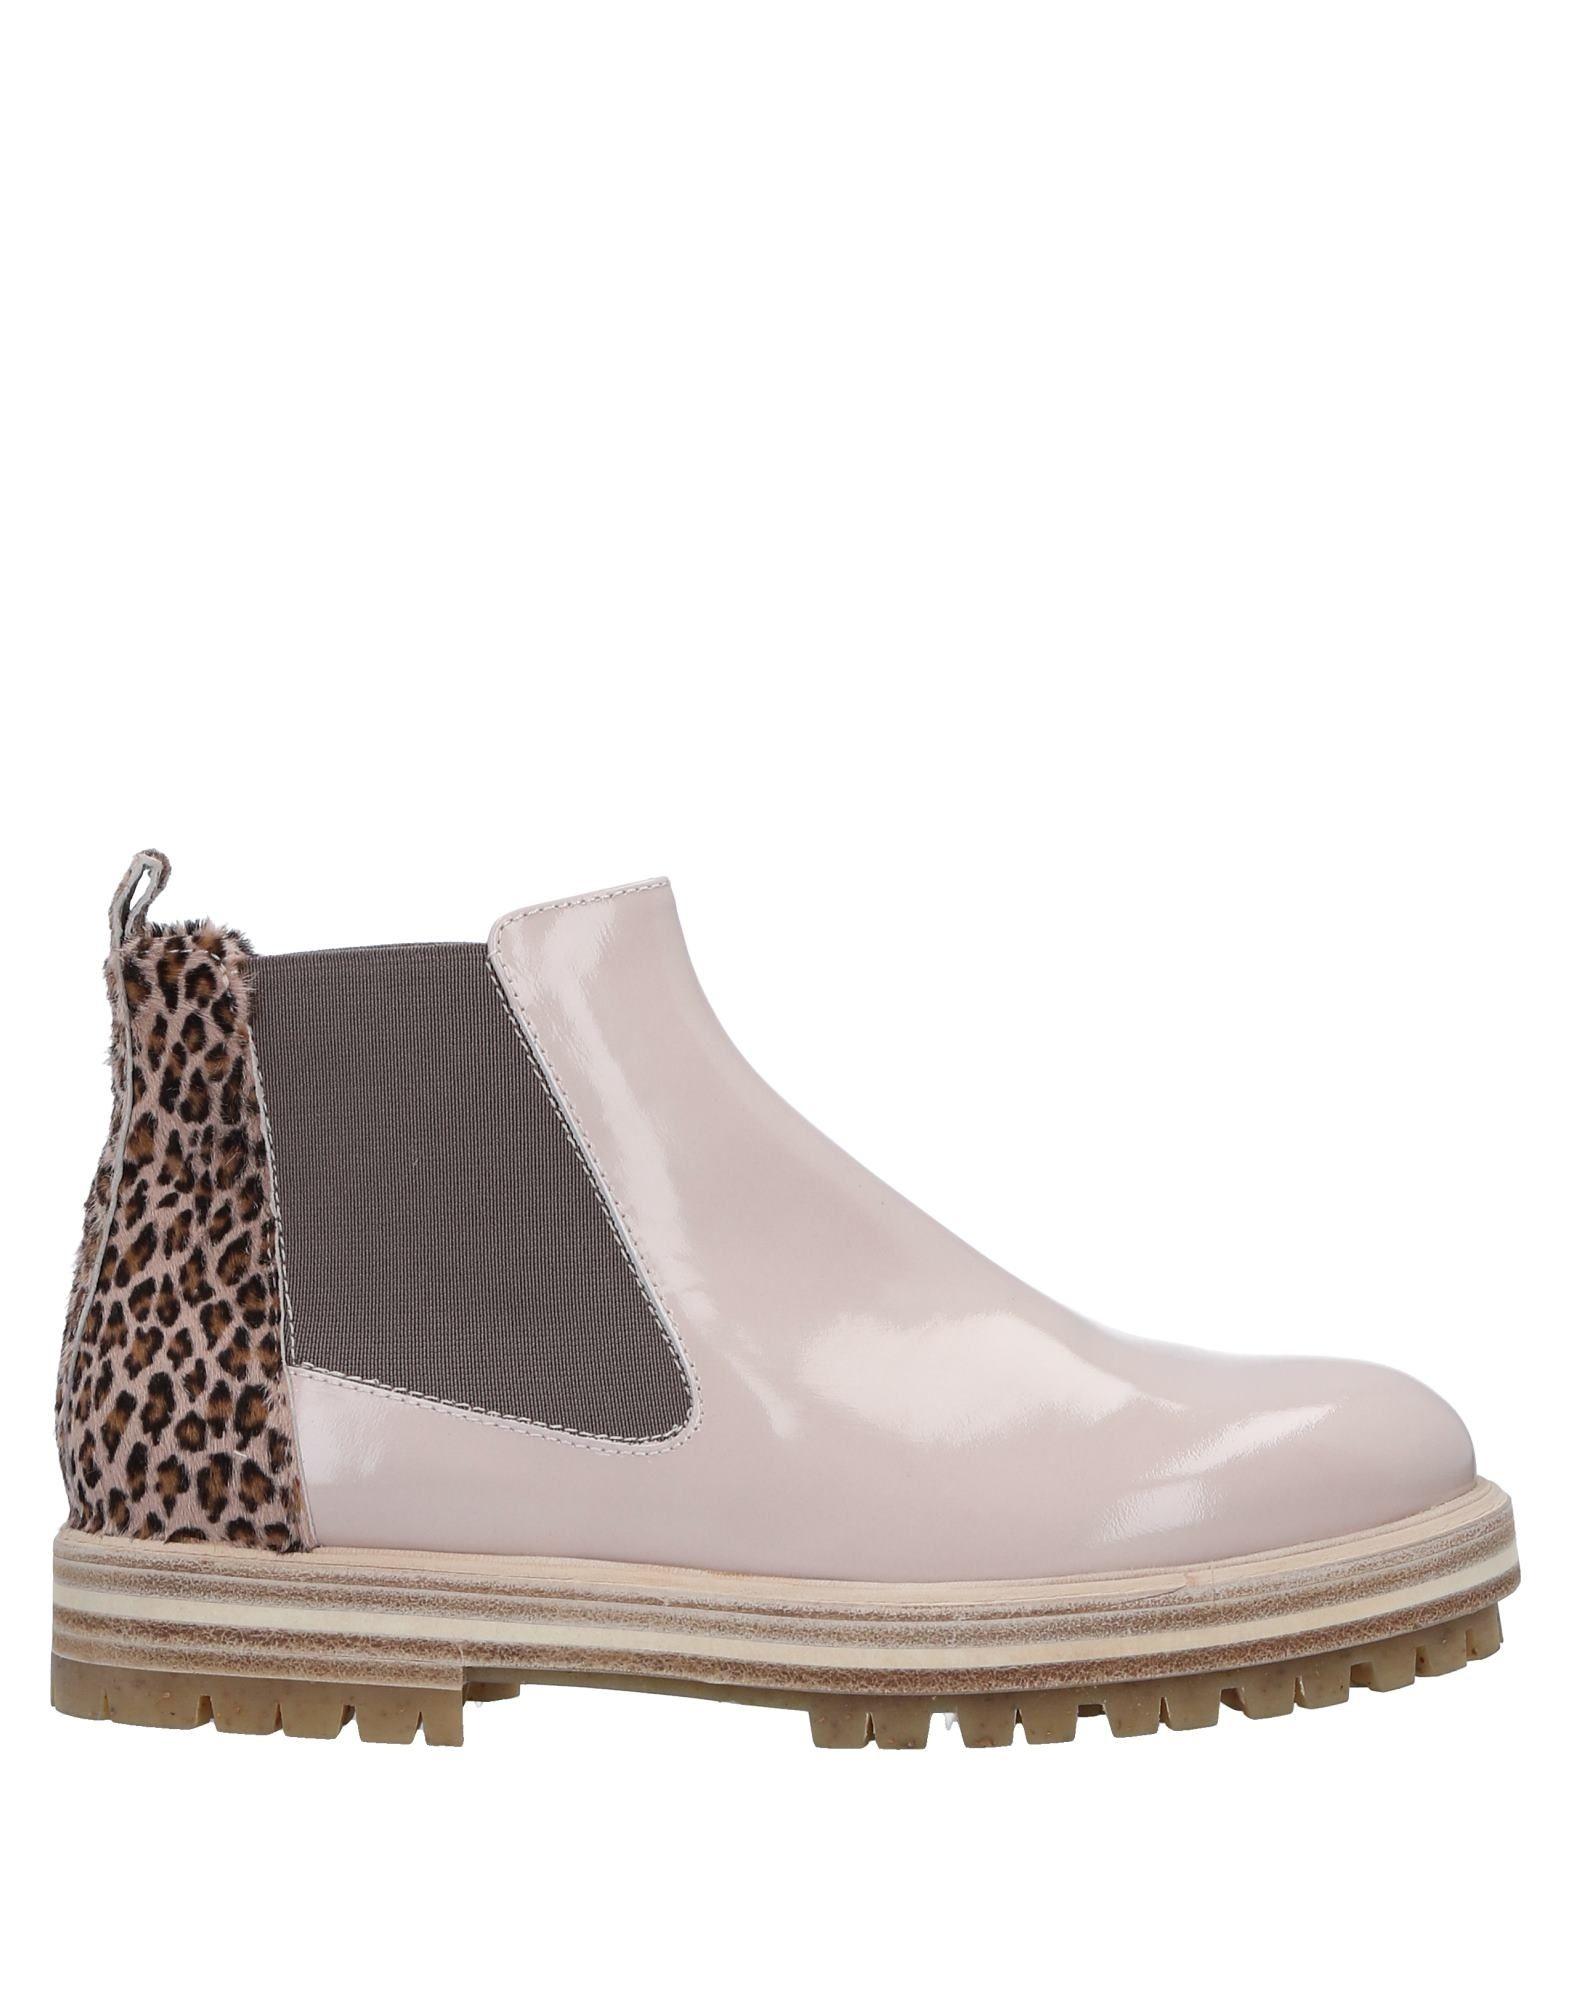 Rabatt Schuhe Agl Damen Attilio Giusti Leombruni Chelsea Boots Damen Agl  11539924RO 222929